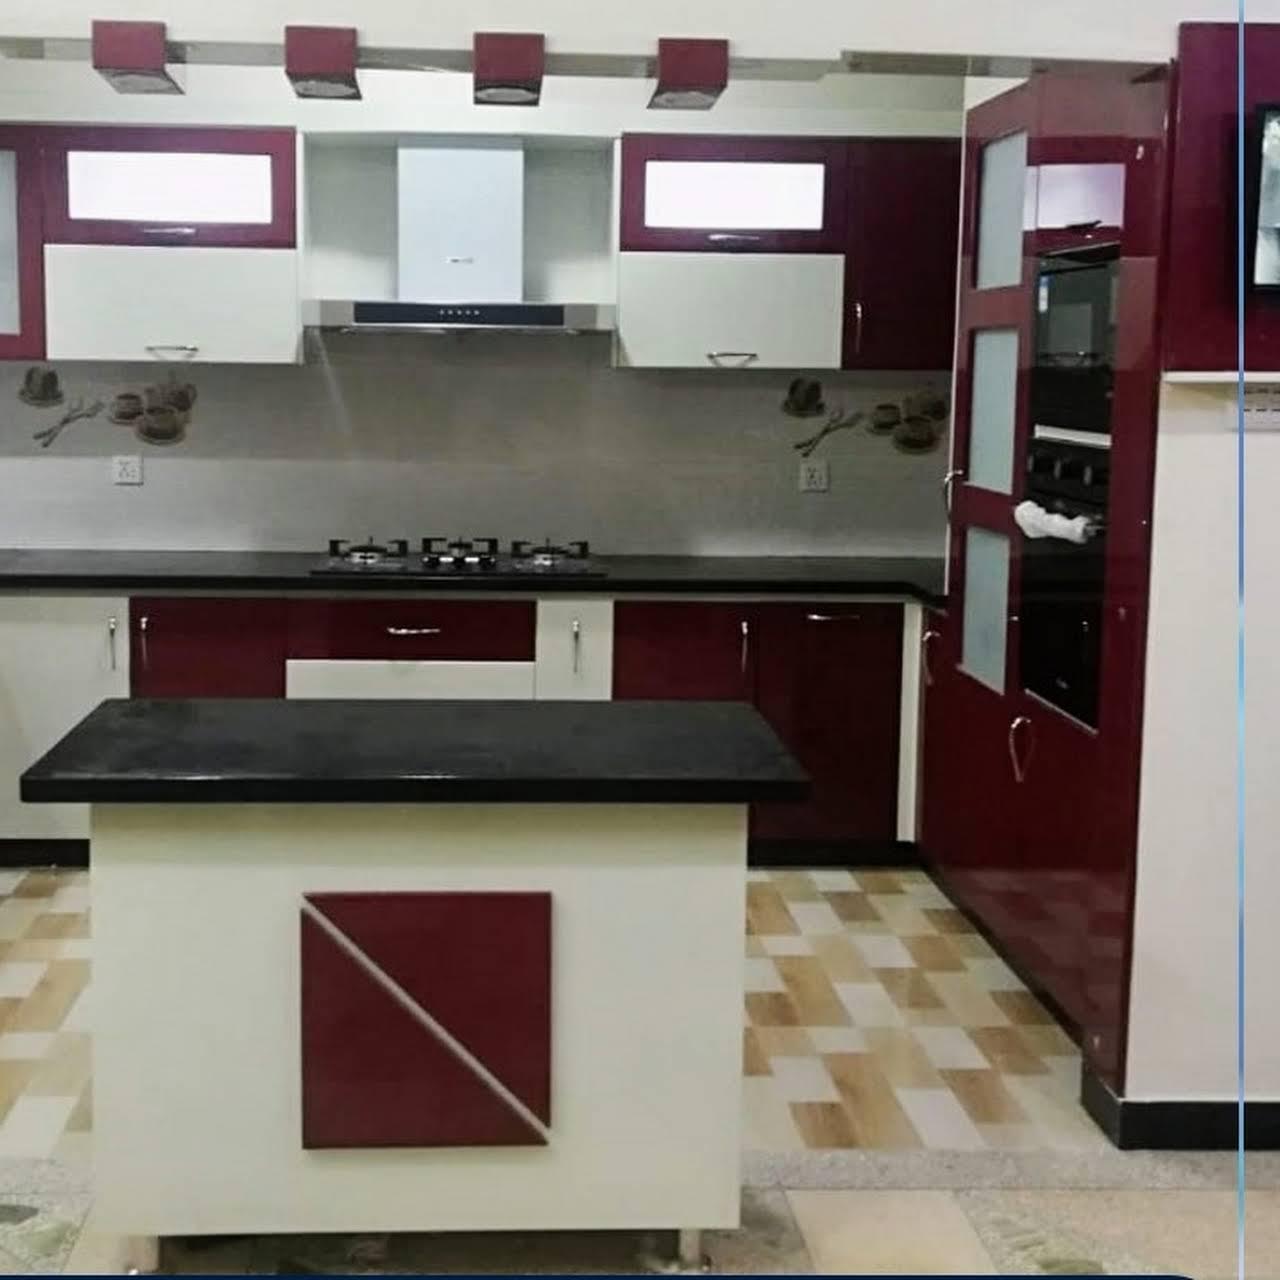 Mini Cucine Italian Kitchens Pakistan Mini Cucine Pakistan Is A Premier Kitchen Supplier Designer And Interior Expert